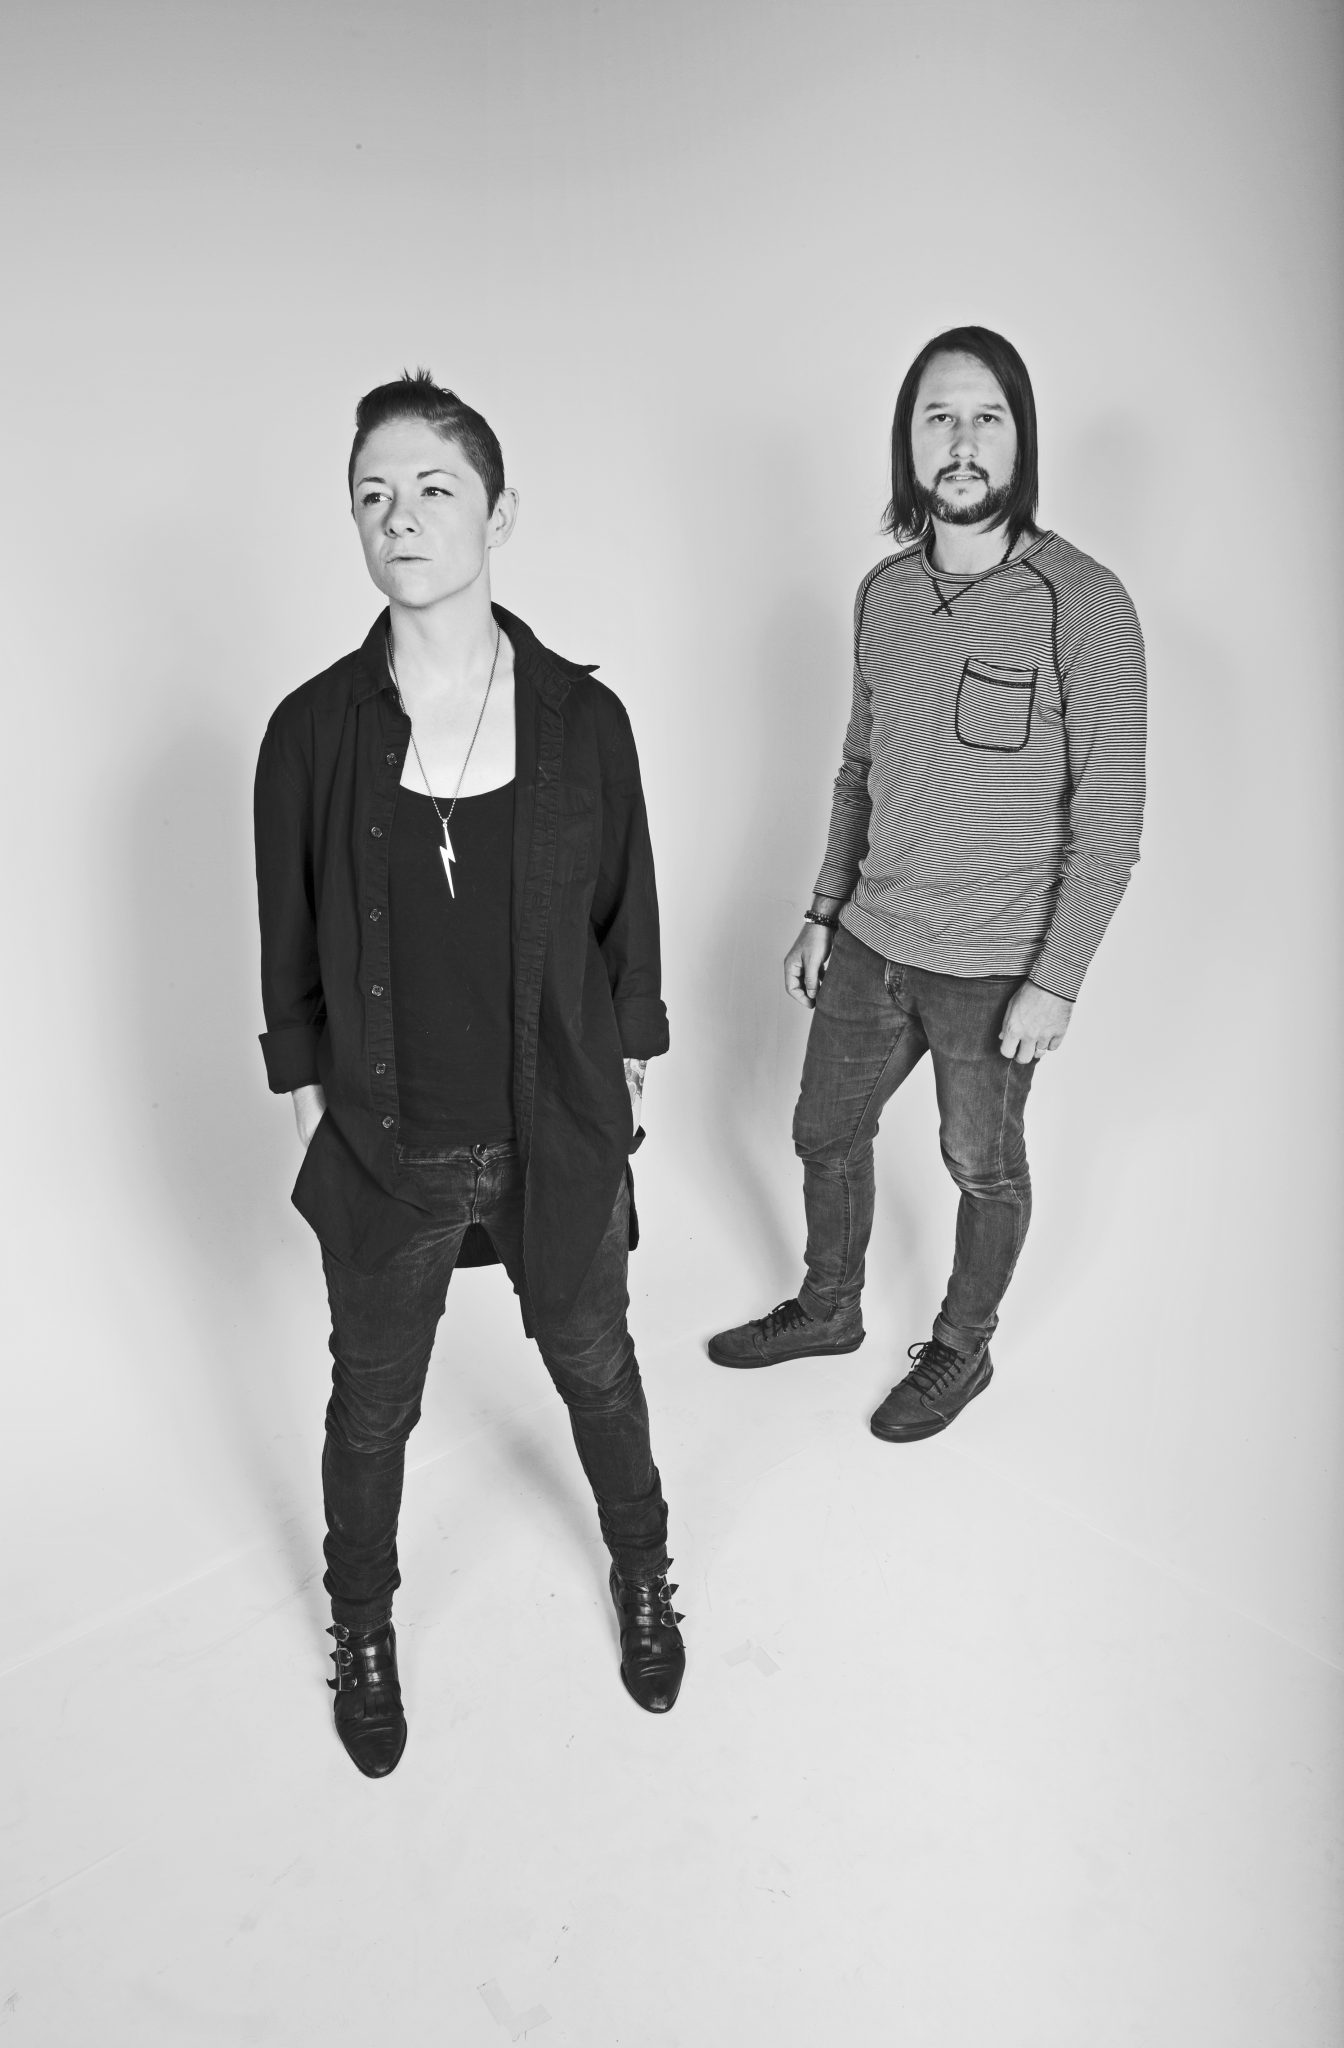 Top 5 New Indie Rock Week 8-indie music-new music-music blog-wolfinasuit-wolf in a suit